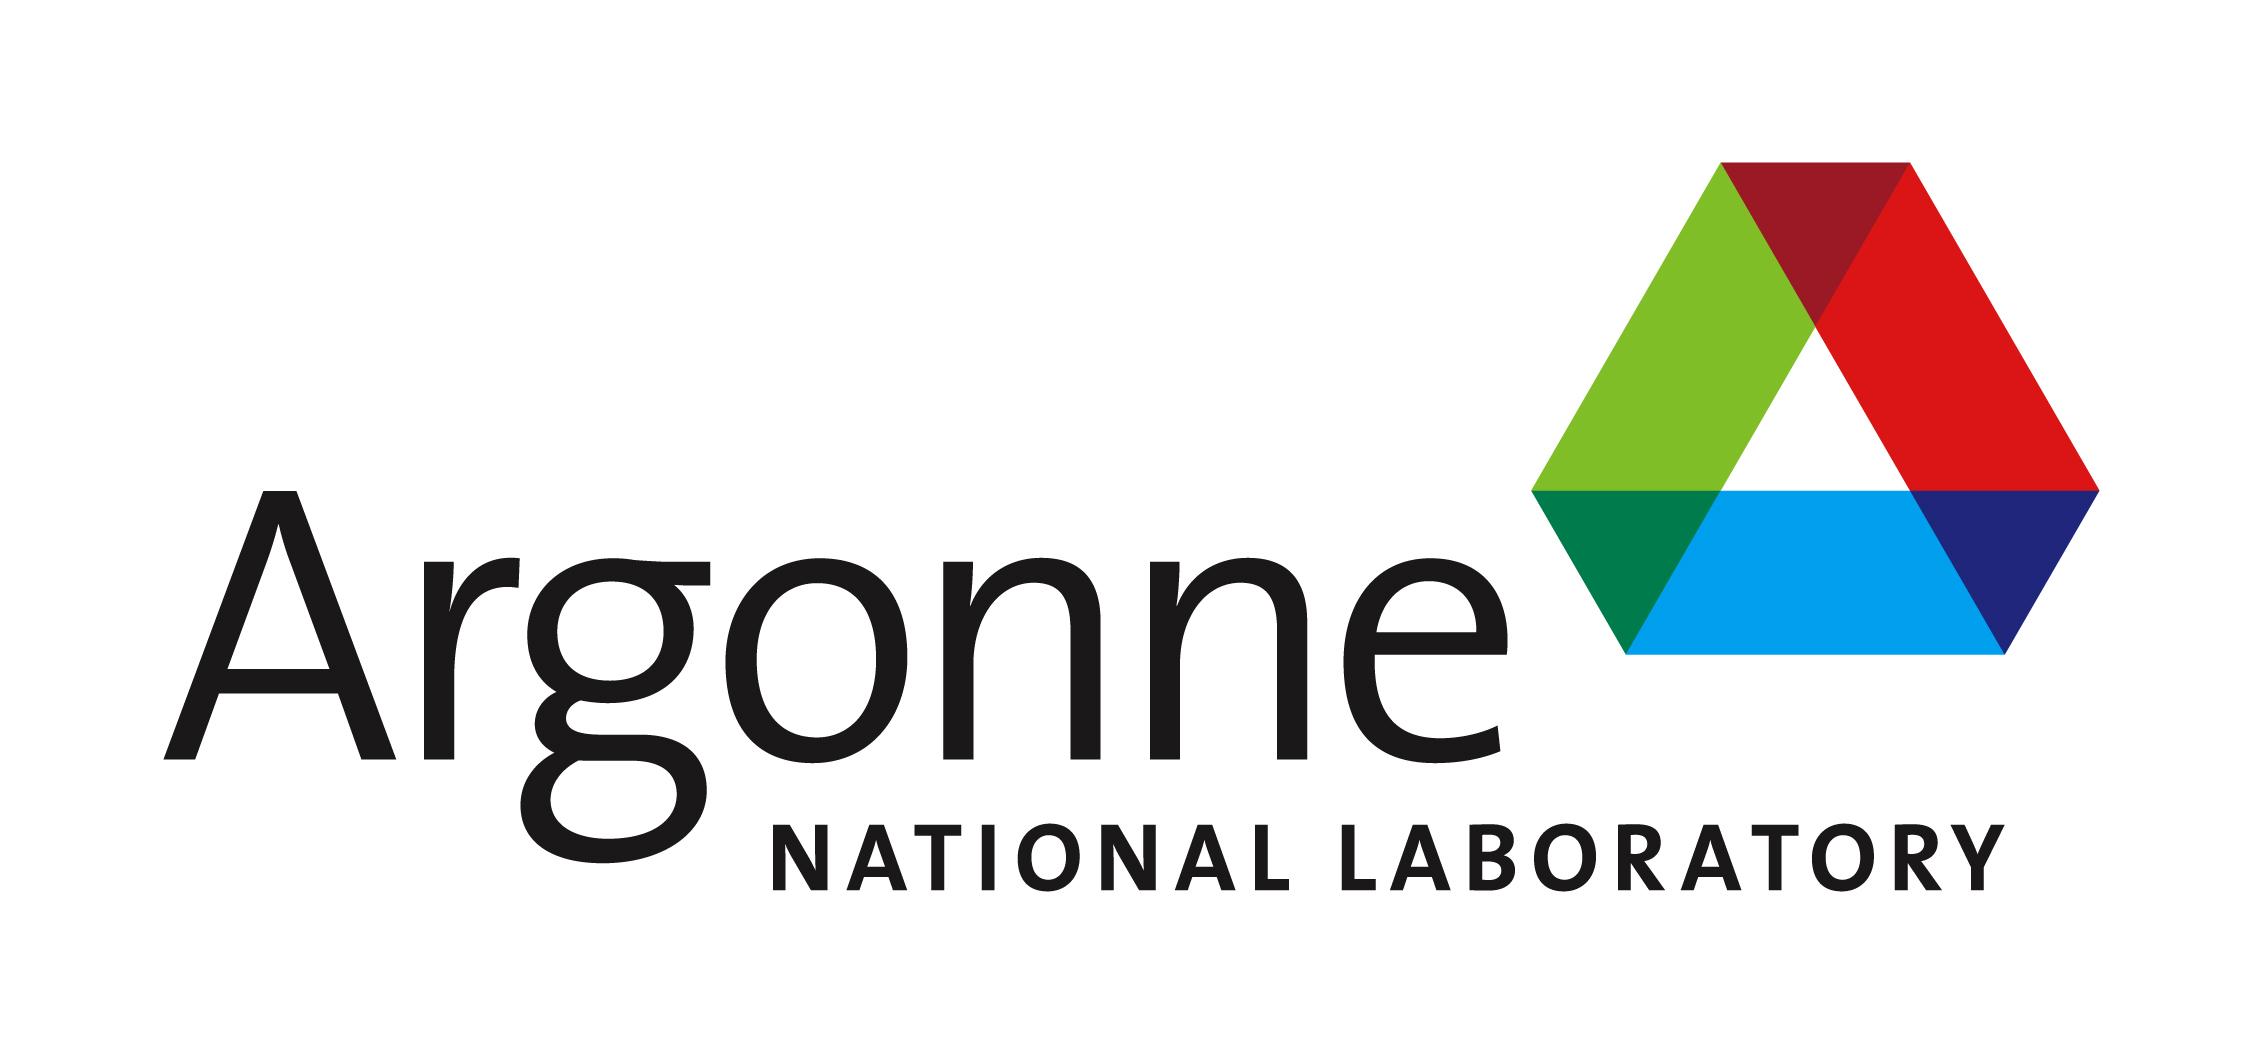 Argonne National Laboratory Logo.jpg